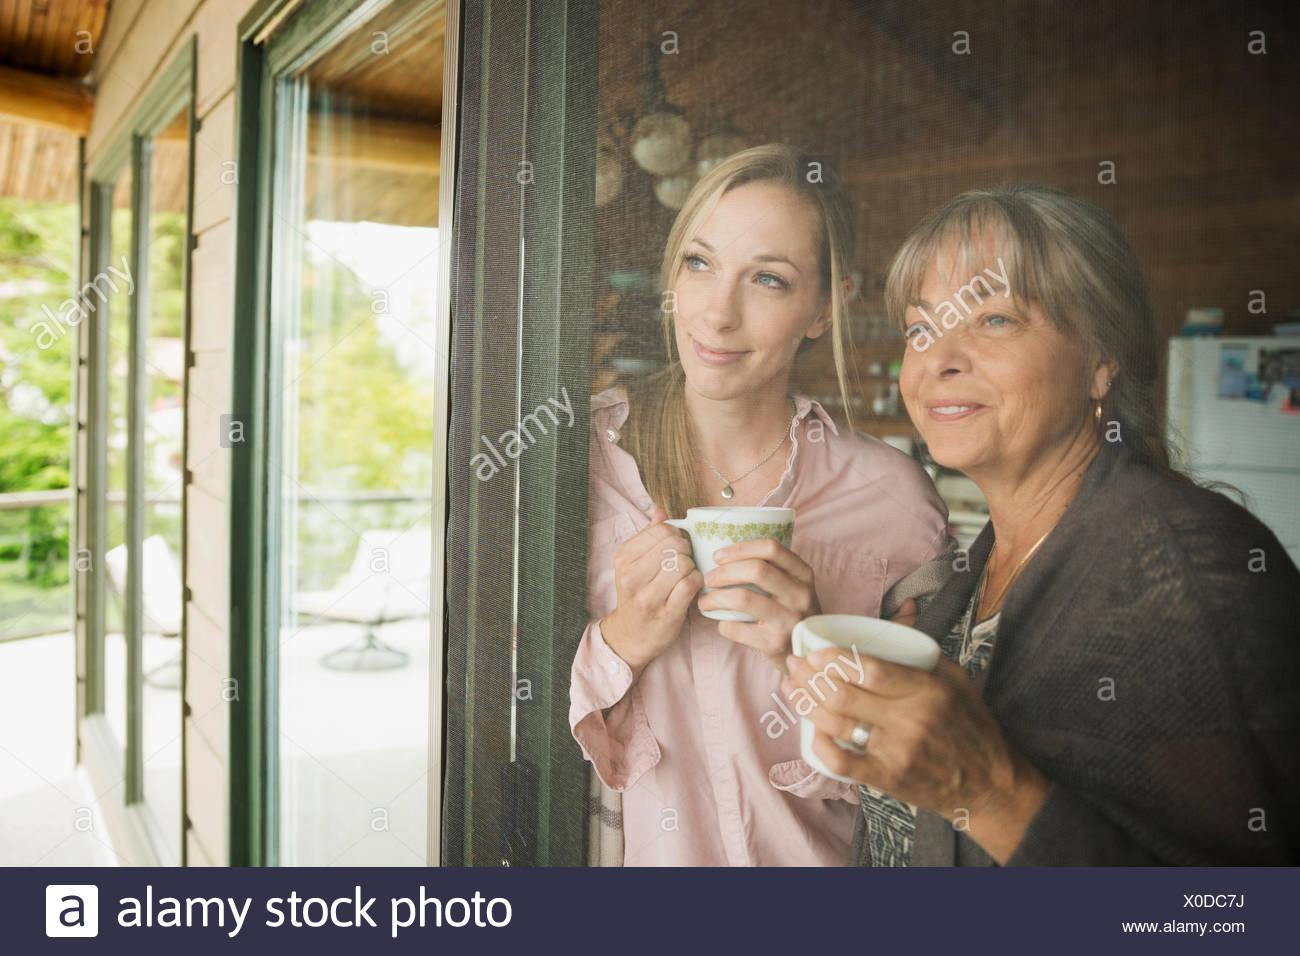 Mother and daughter drinking coffee cabin screen door - Stock Image